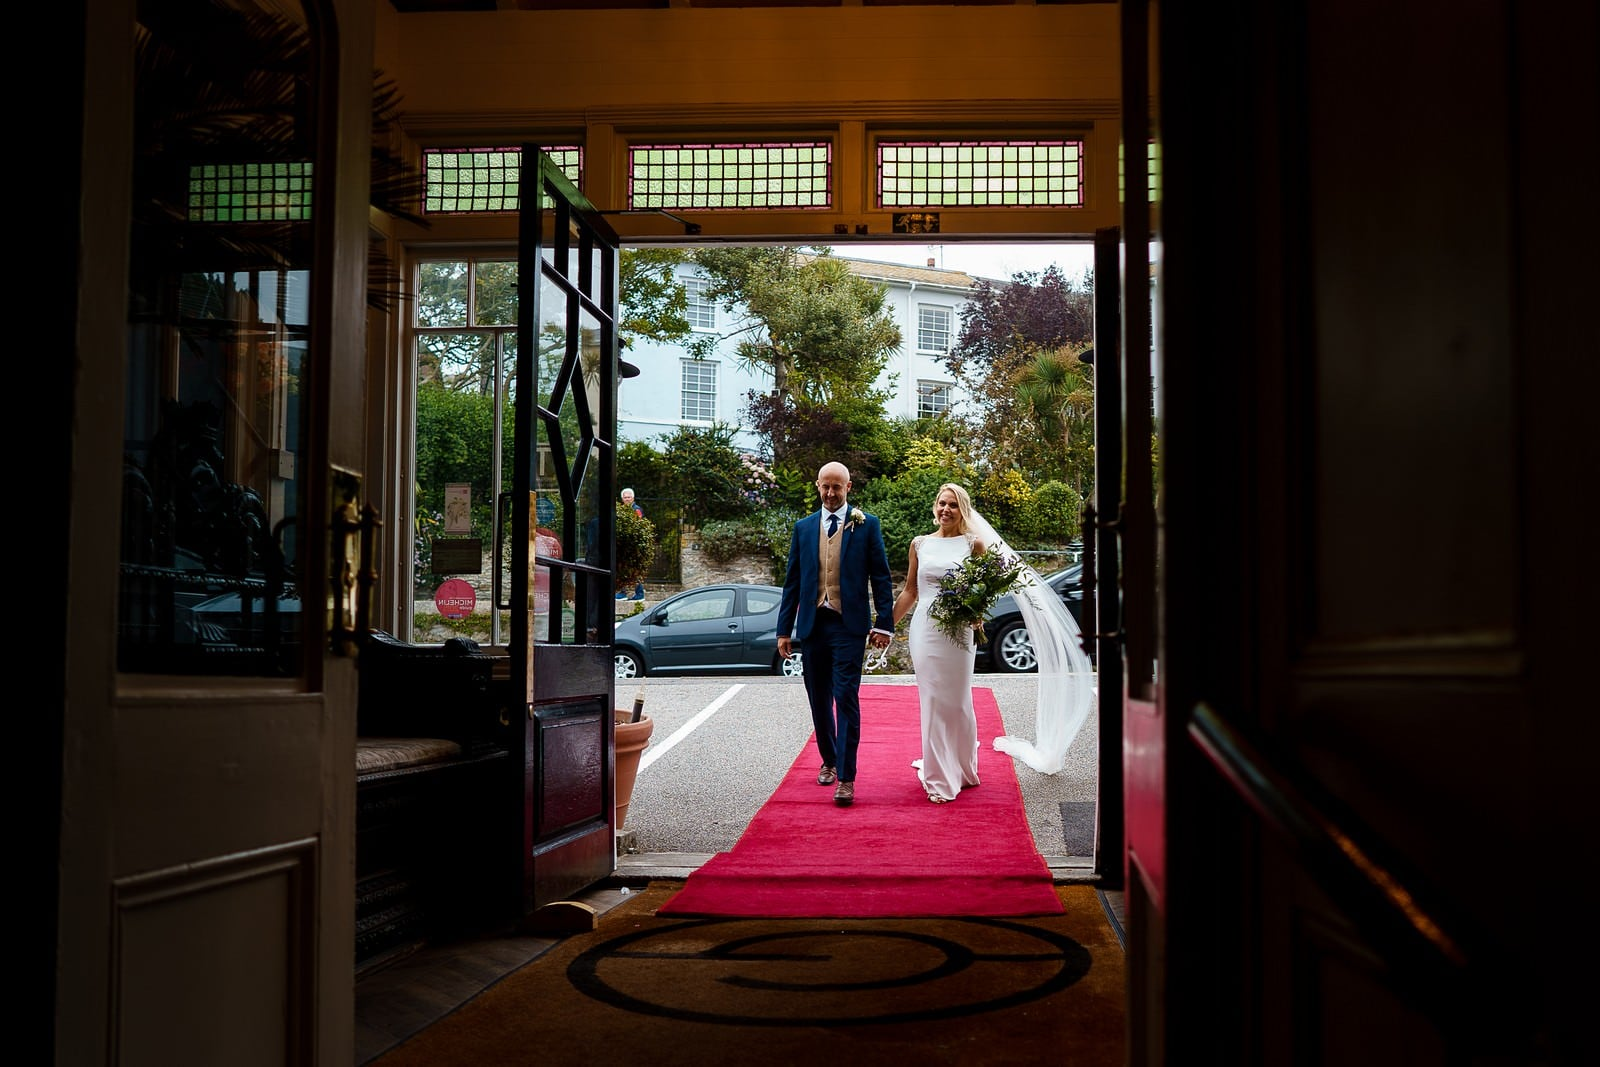 Greenbank hotel wedding photographer 8